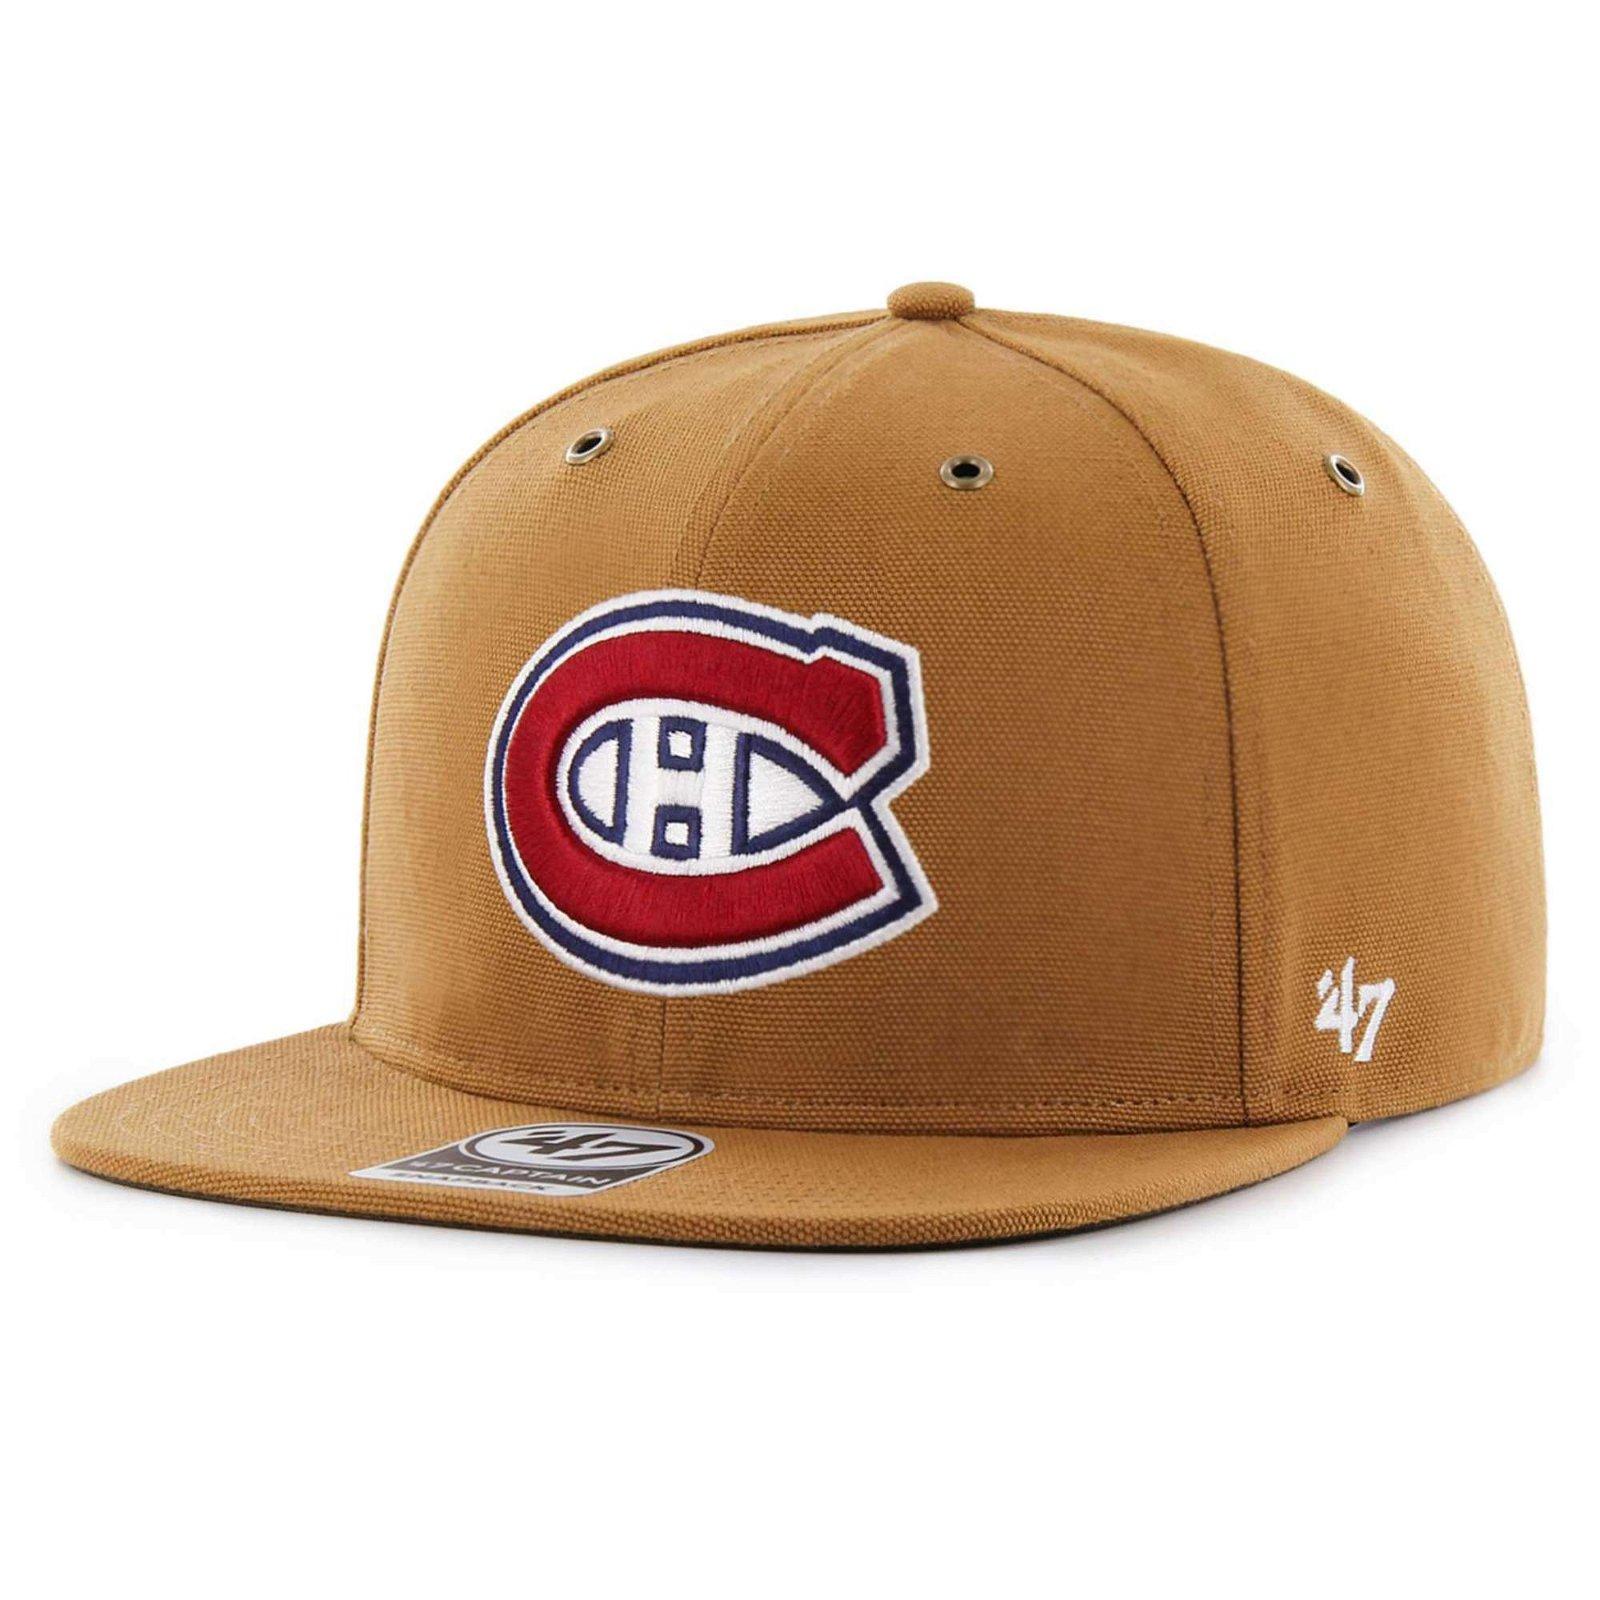 6cf3ed1639de7 Carhartt  See the hats built to honor hockey s Original 6